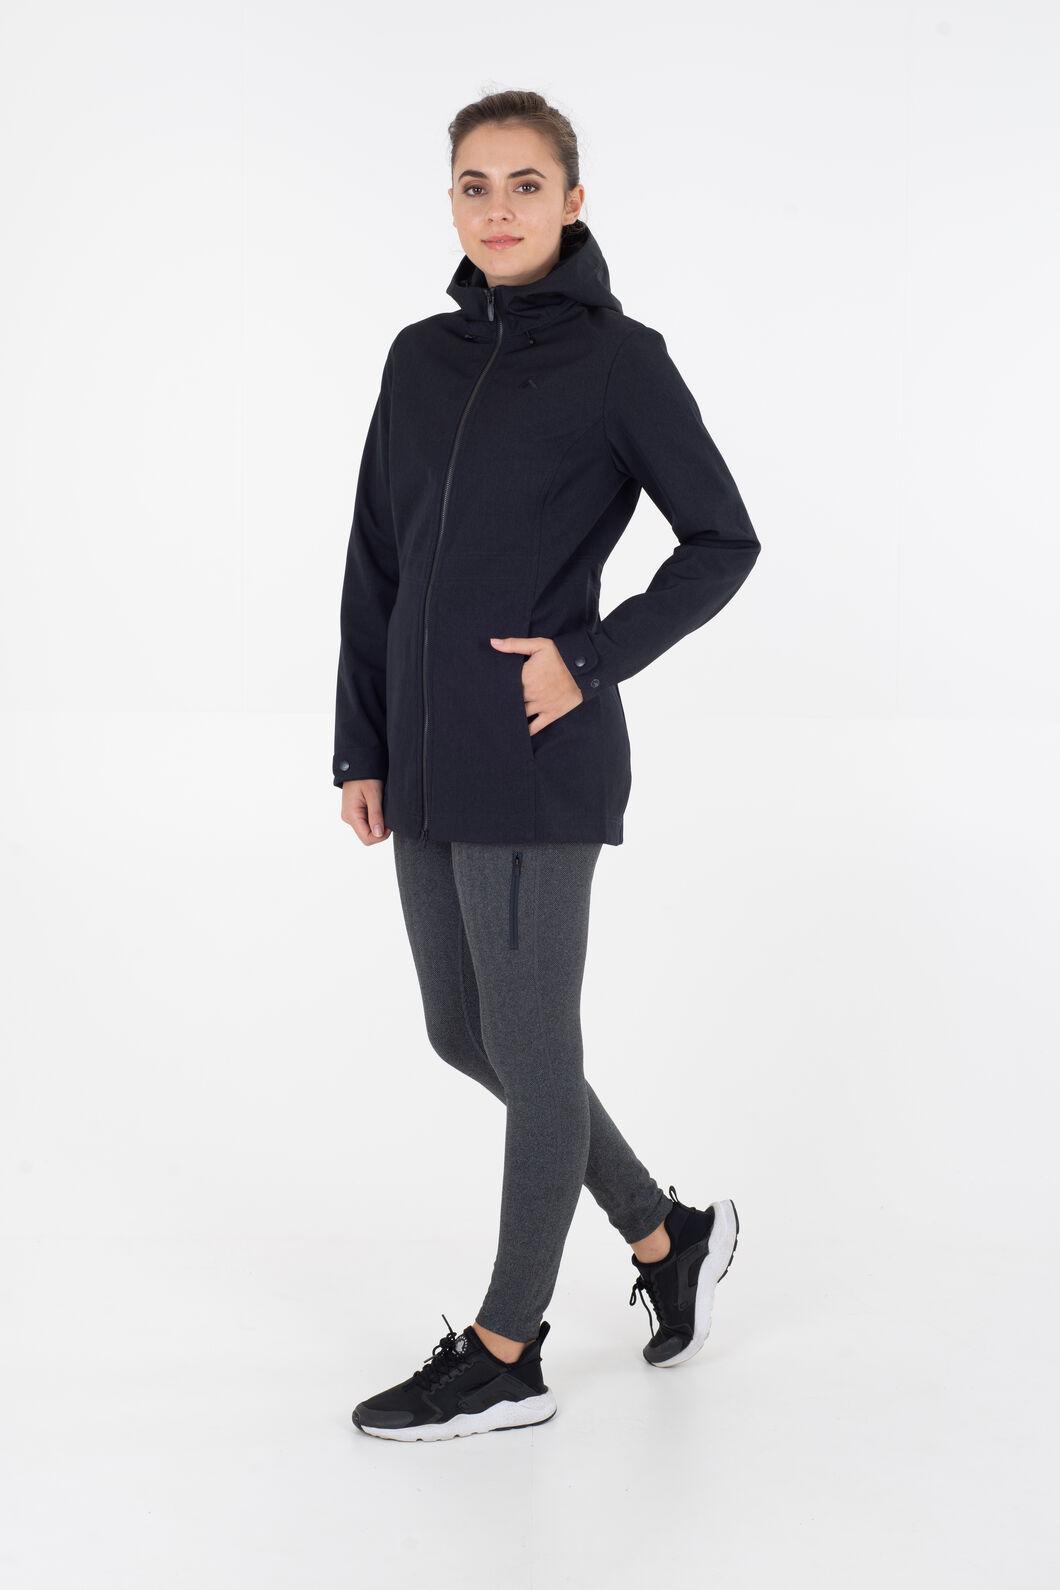 Macpac Chord Softshell Jacket - Women's, Black, hi-res